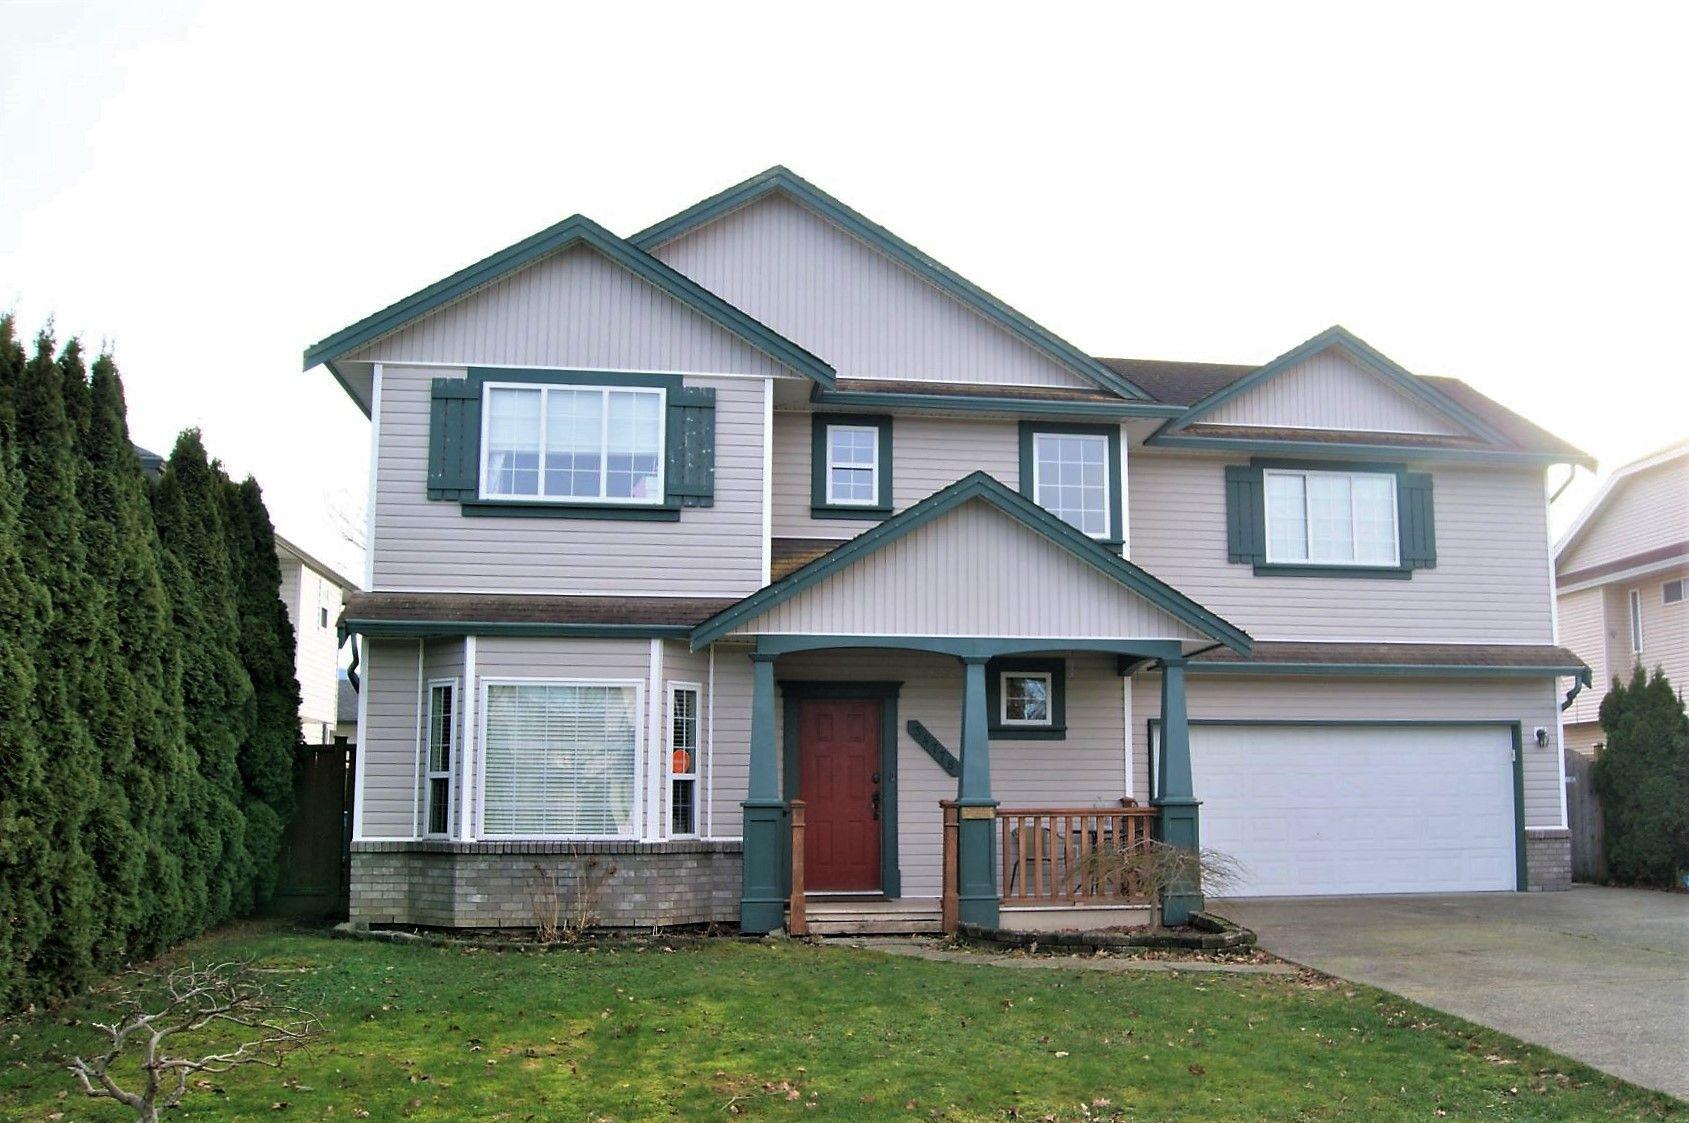 "Main Photo: 34778 6 Avenue in Abbotsford: Poplar House for sale in ""HUNTINGDON VILLAGE"" : MLS®# R2530537"